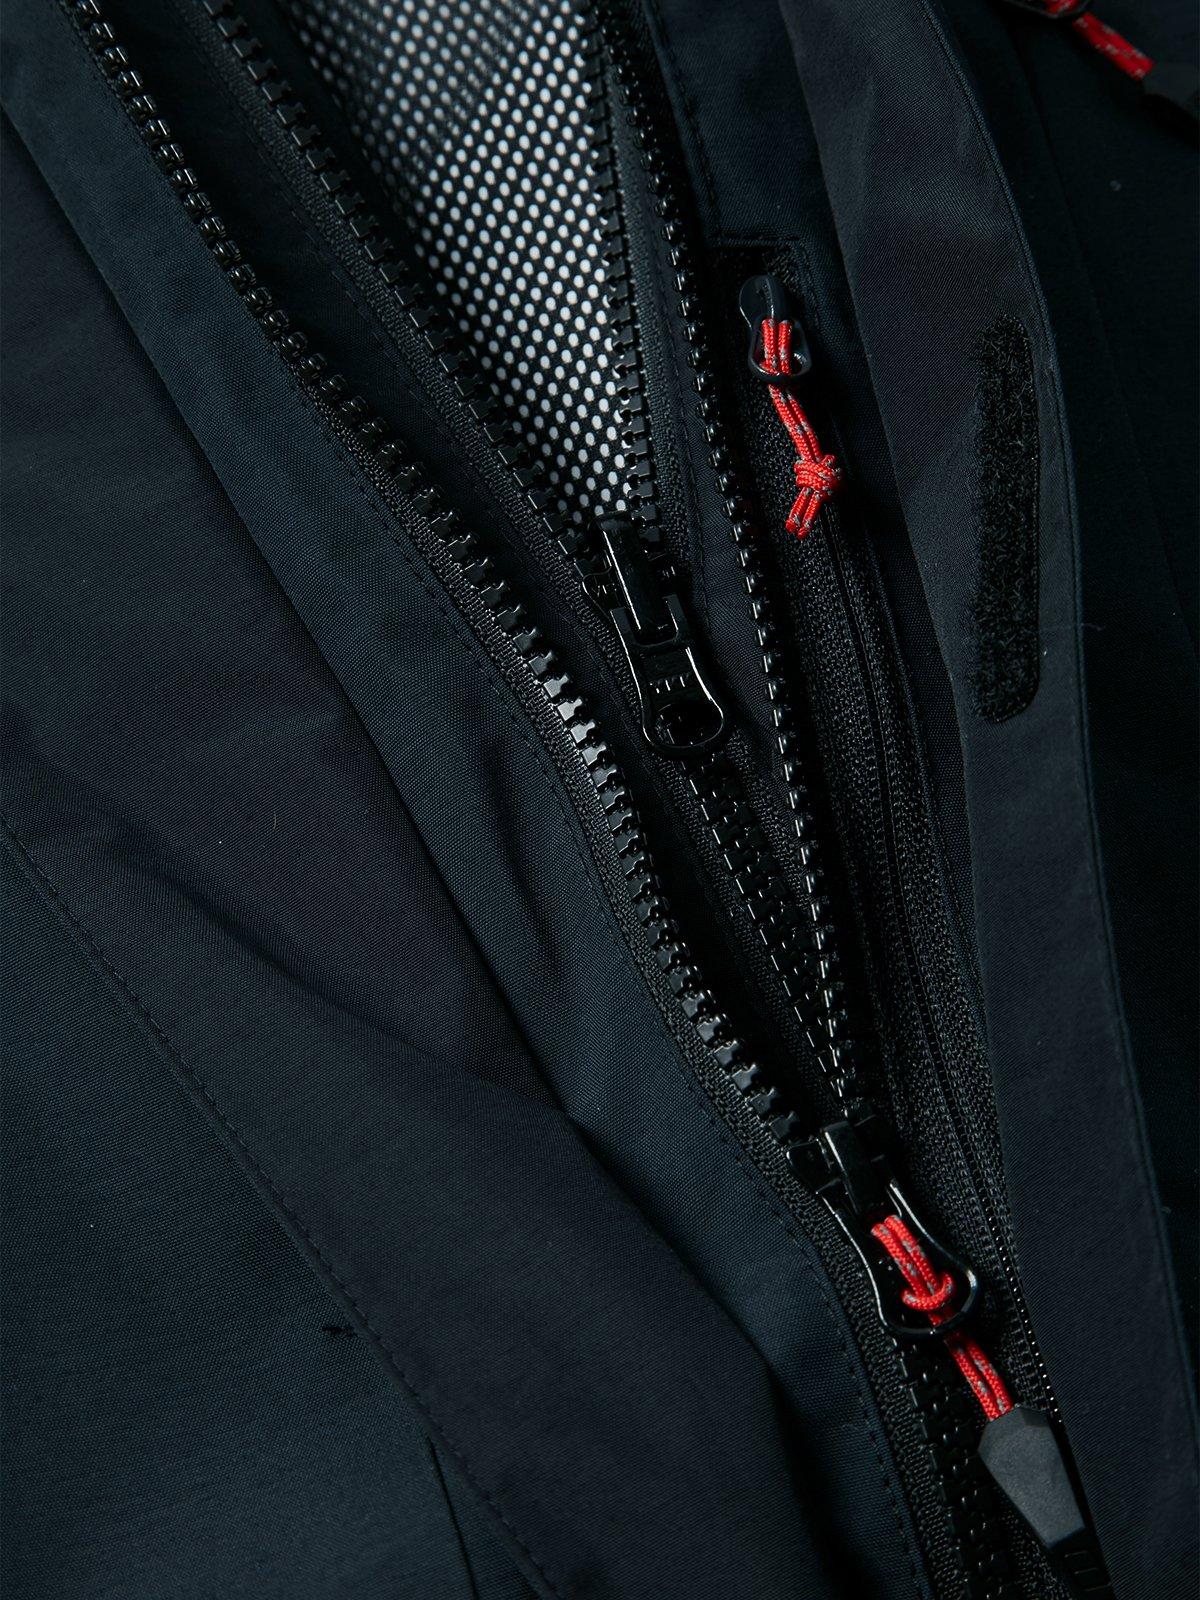 81Wt 0VuAvL - Berghaus Women's Hillmaster Gore-tex Waterproof Jacket